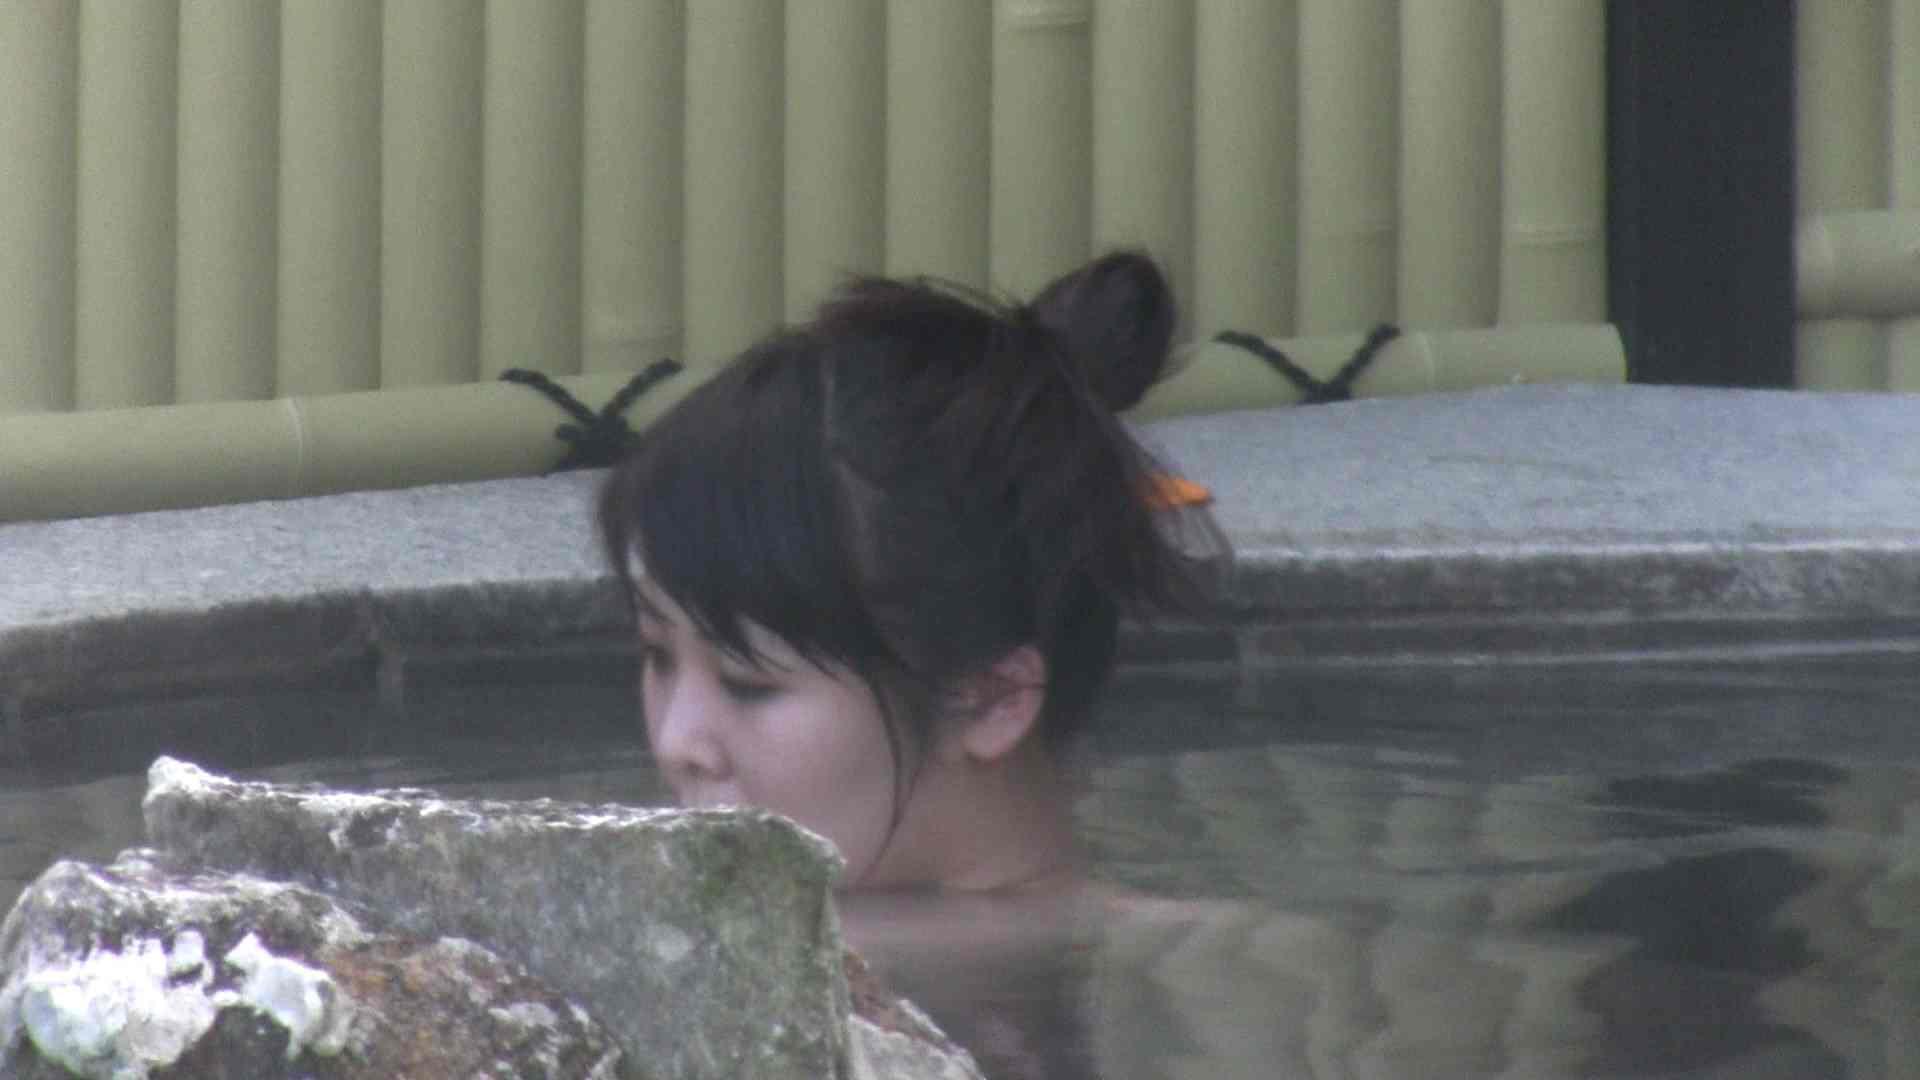 Aquaな露天風呂Vol.118 OL女体  68連発 36